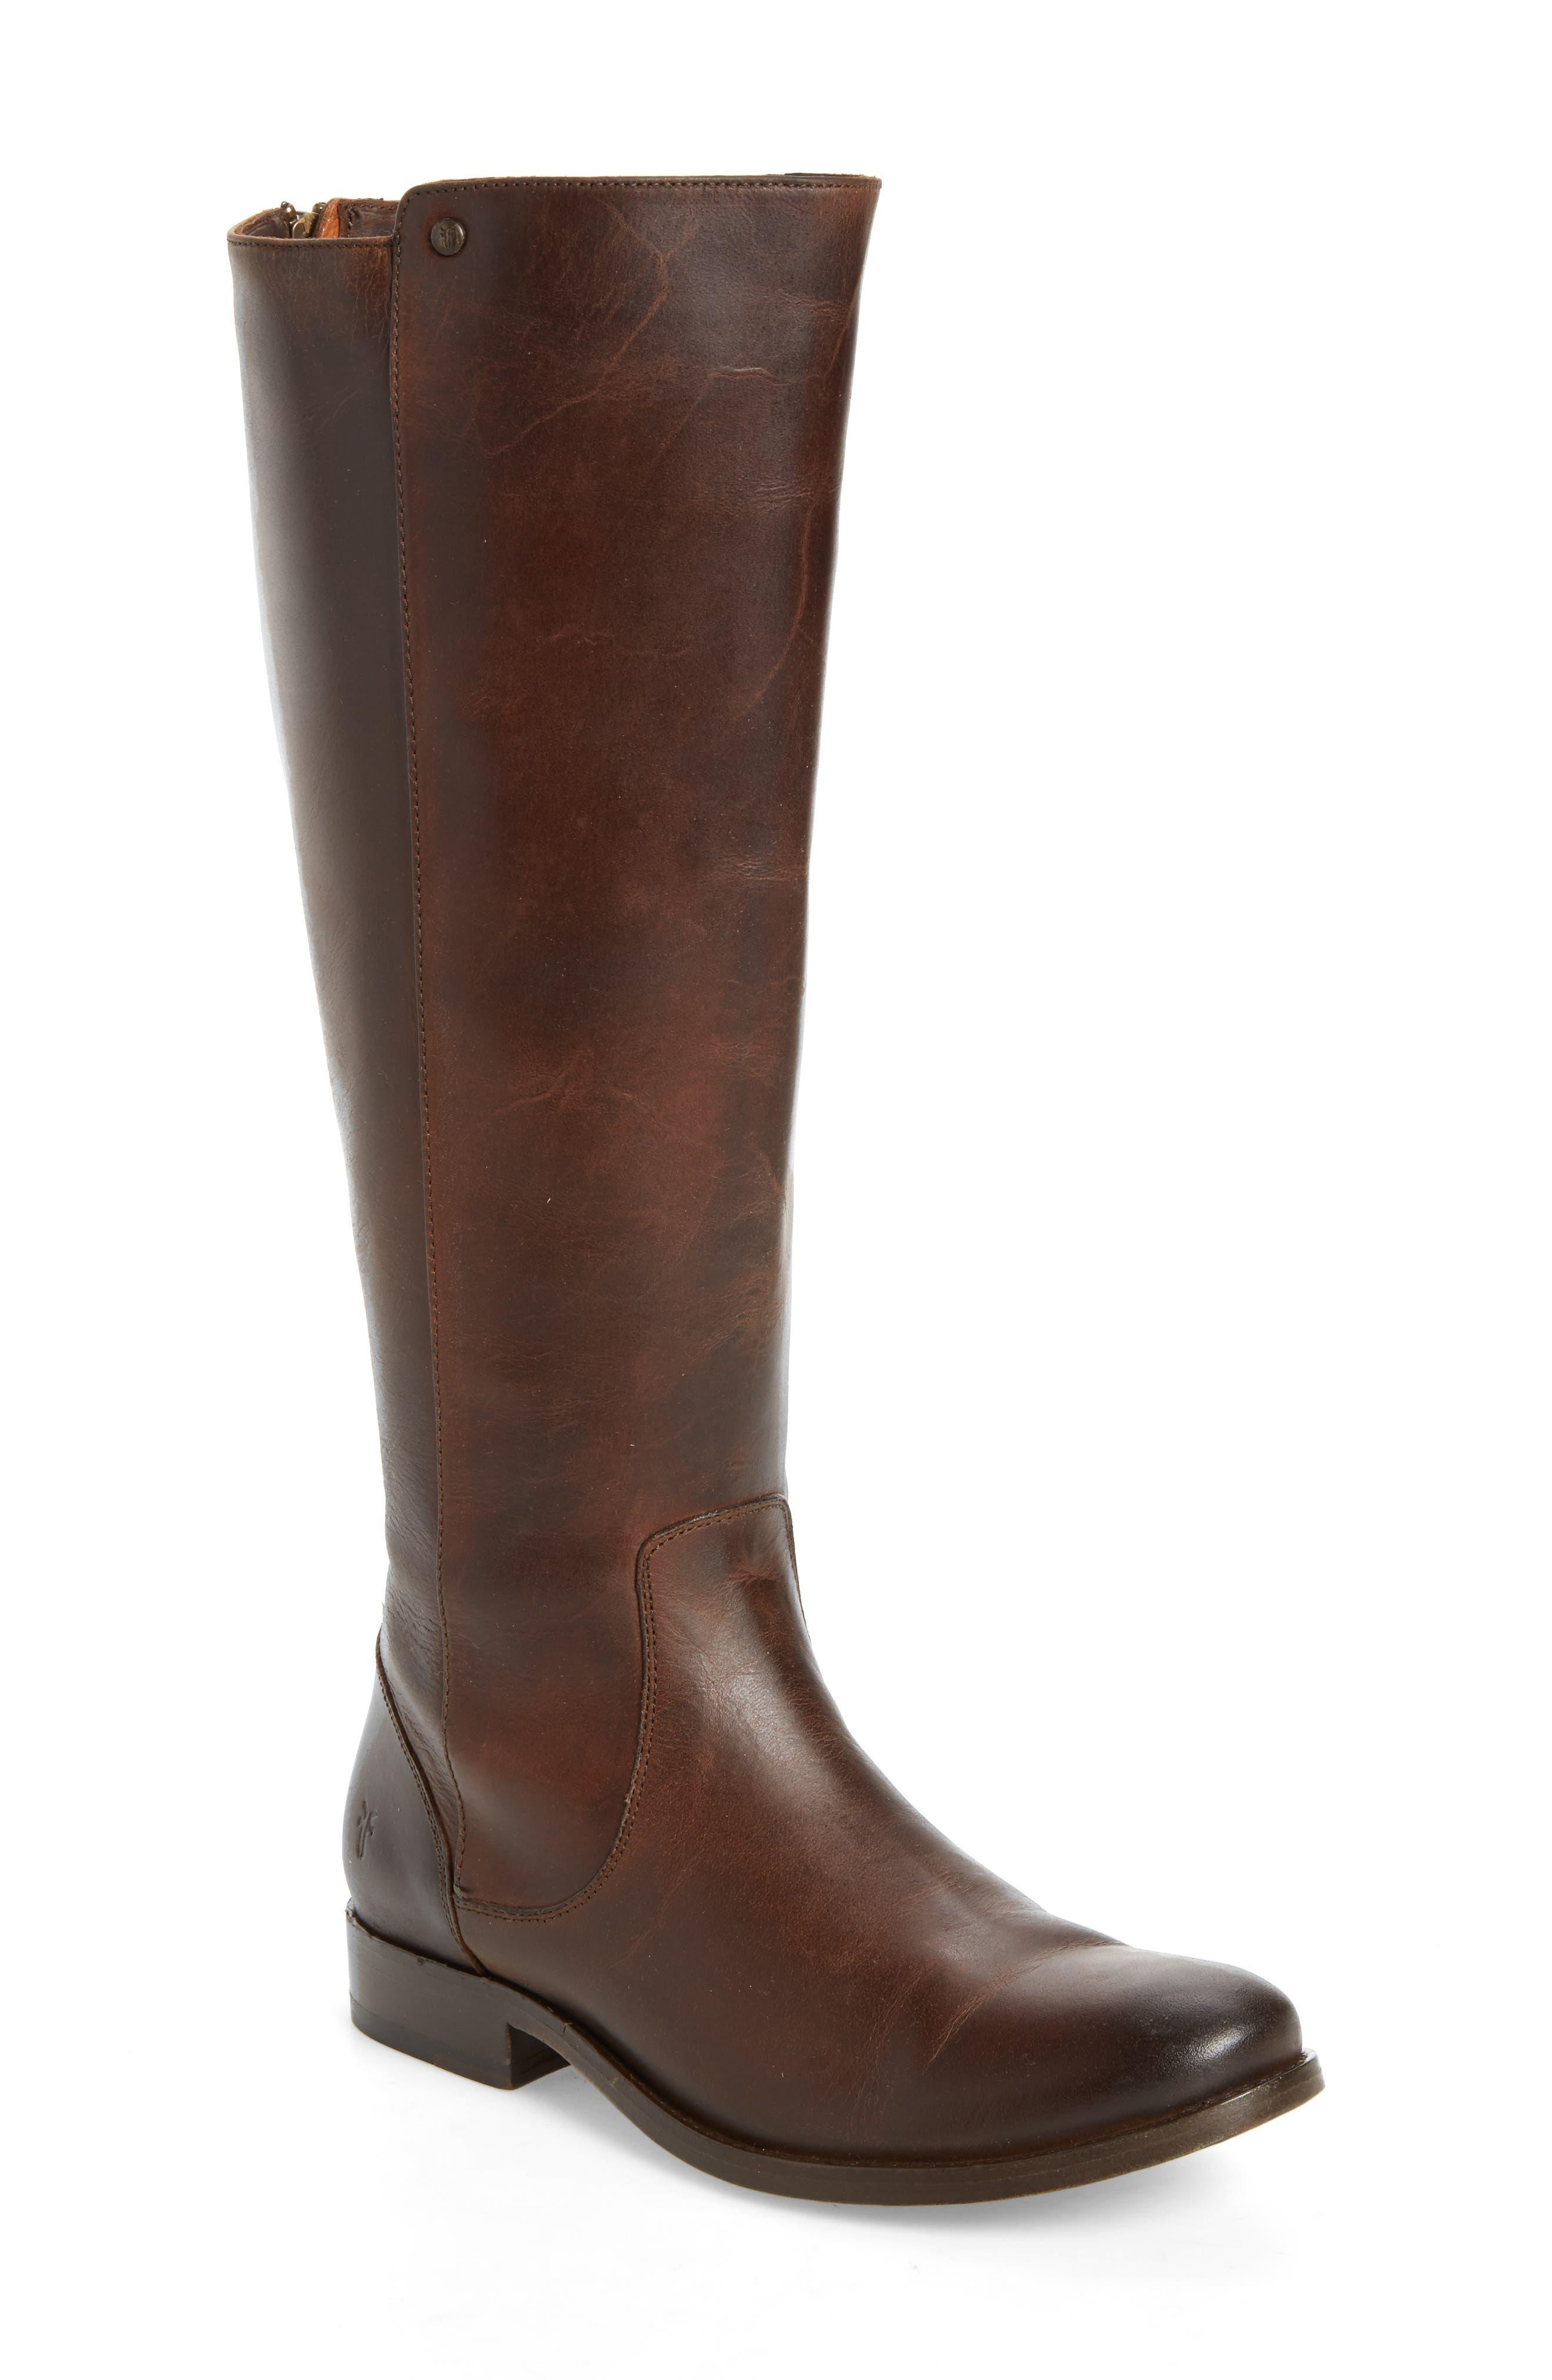 Melissa Stud Knee High Boot,                         Main,                         color, Chocolate Leather